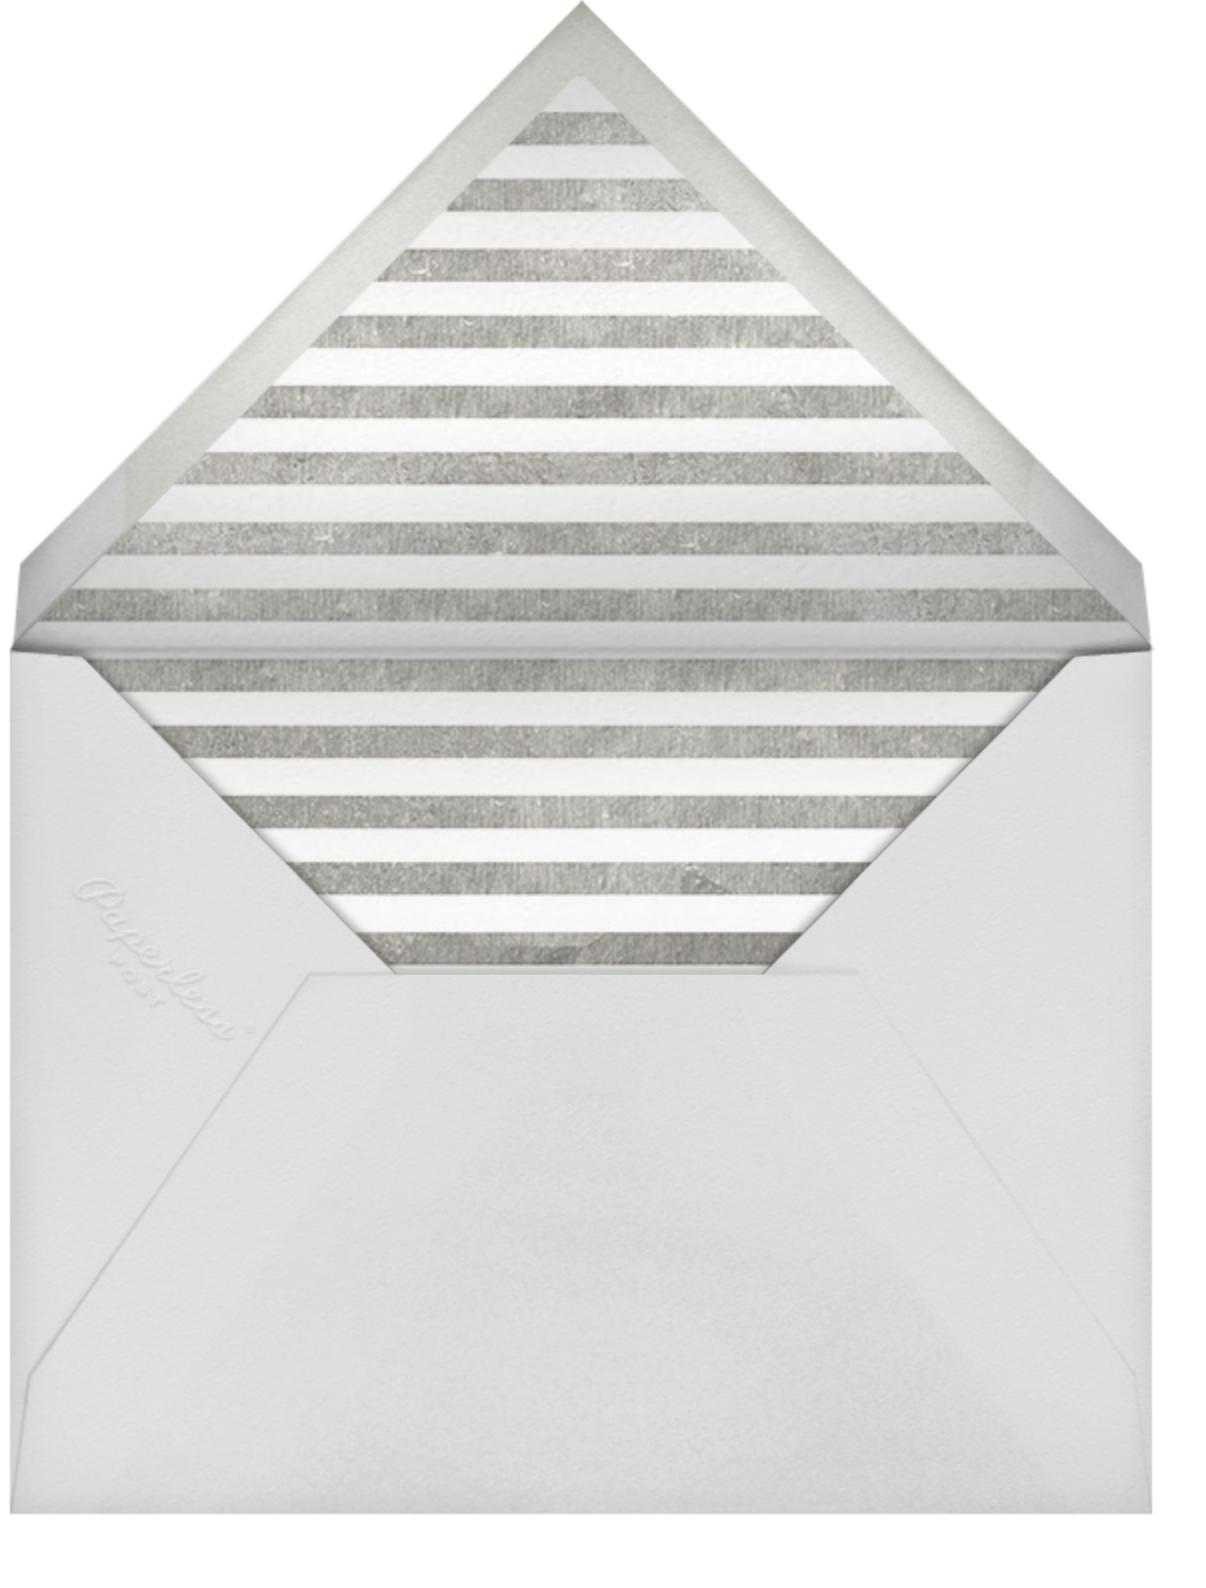 Confetti - White/Silver - kate spade new york - Cocktail party - envelope back